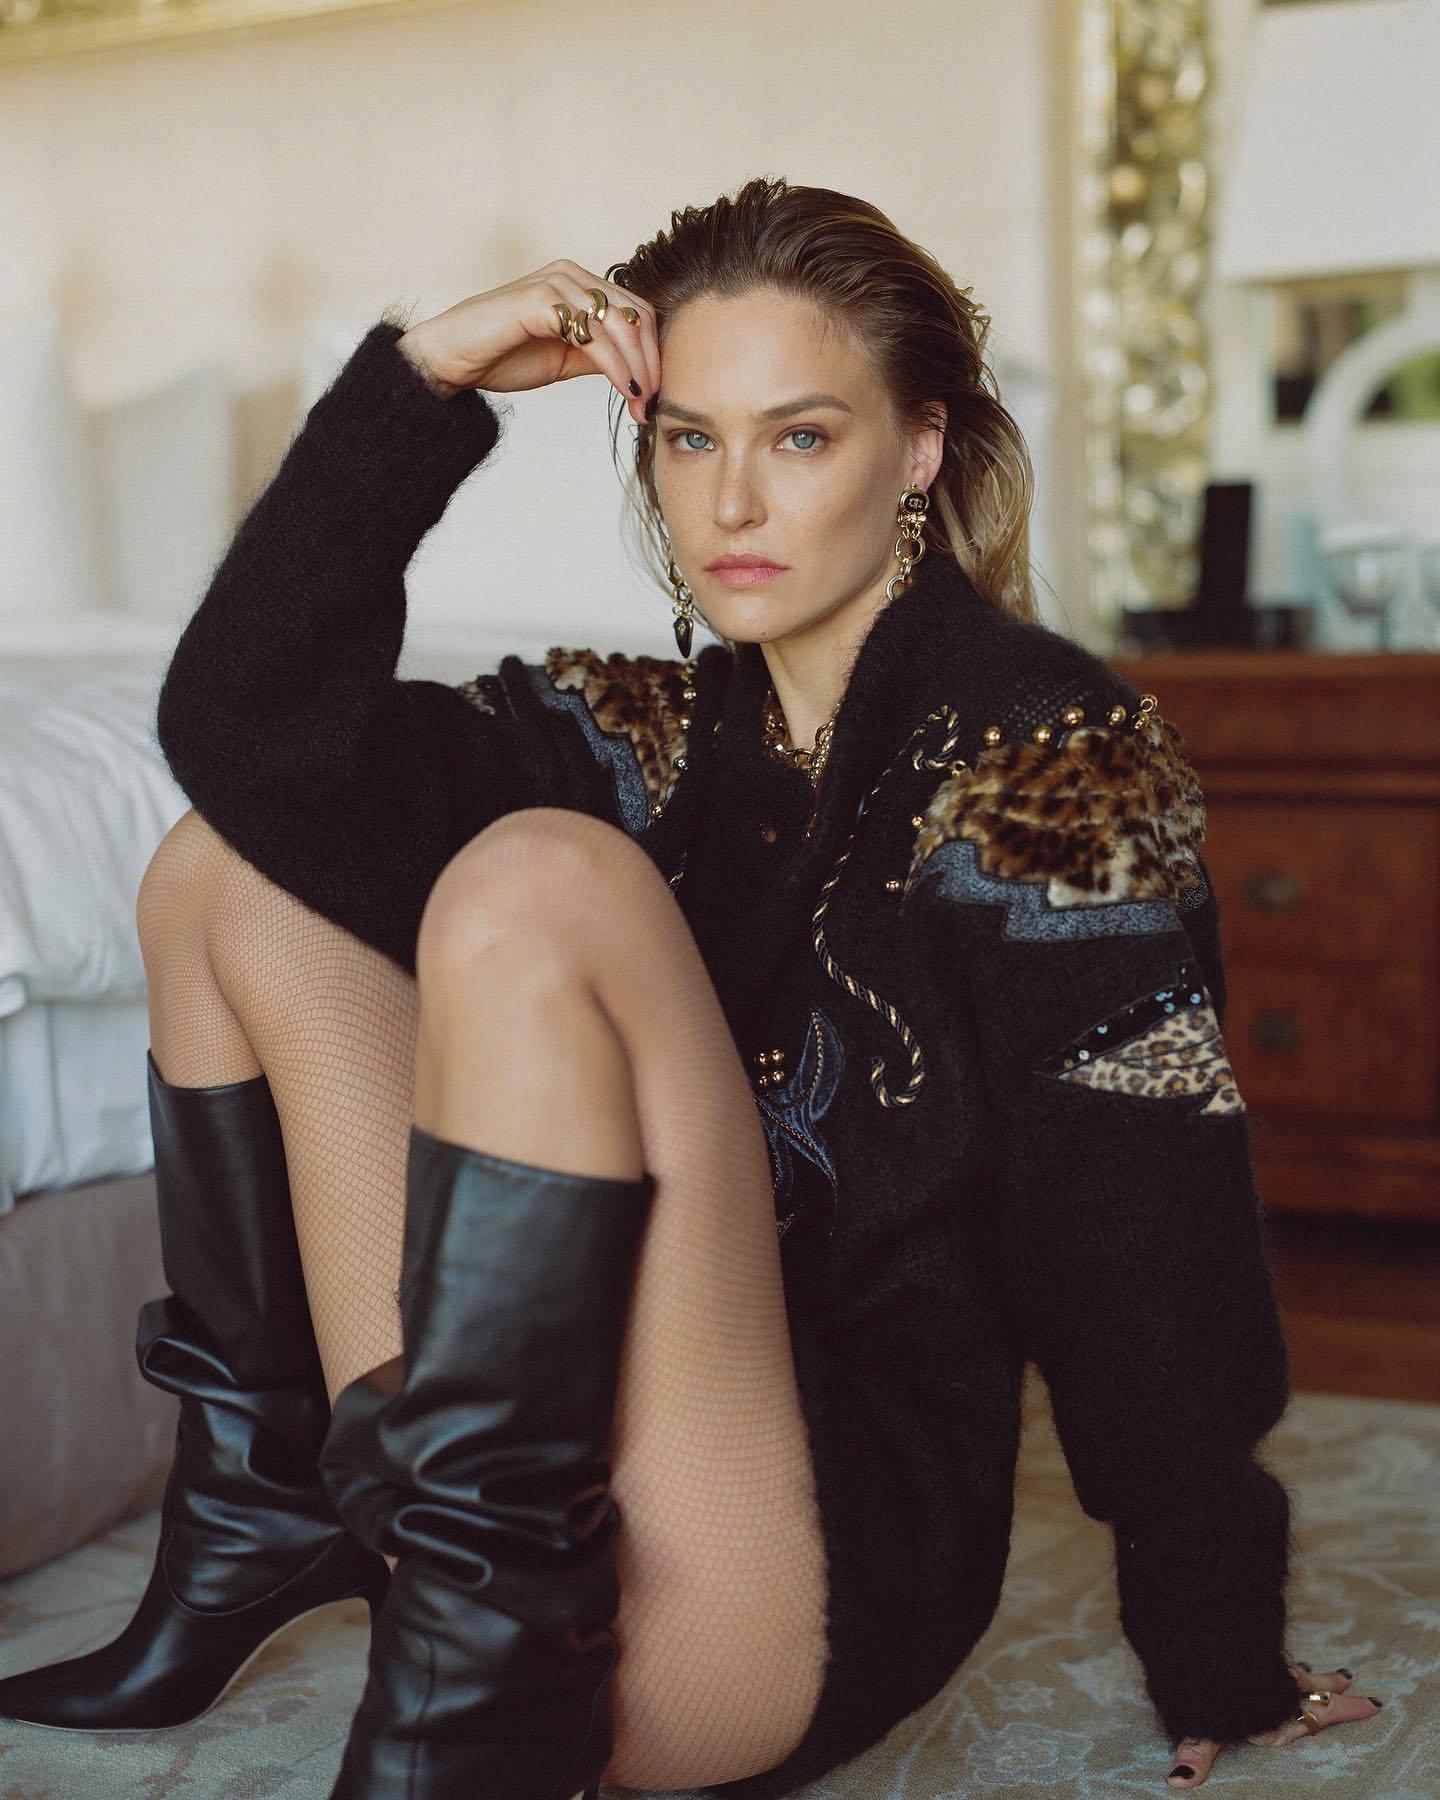 Bar Refaeli – Sexy Legs In Photoshoot For Dodo Bar Or Clothing Line 0001